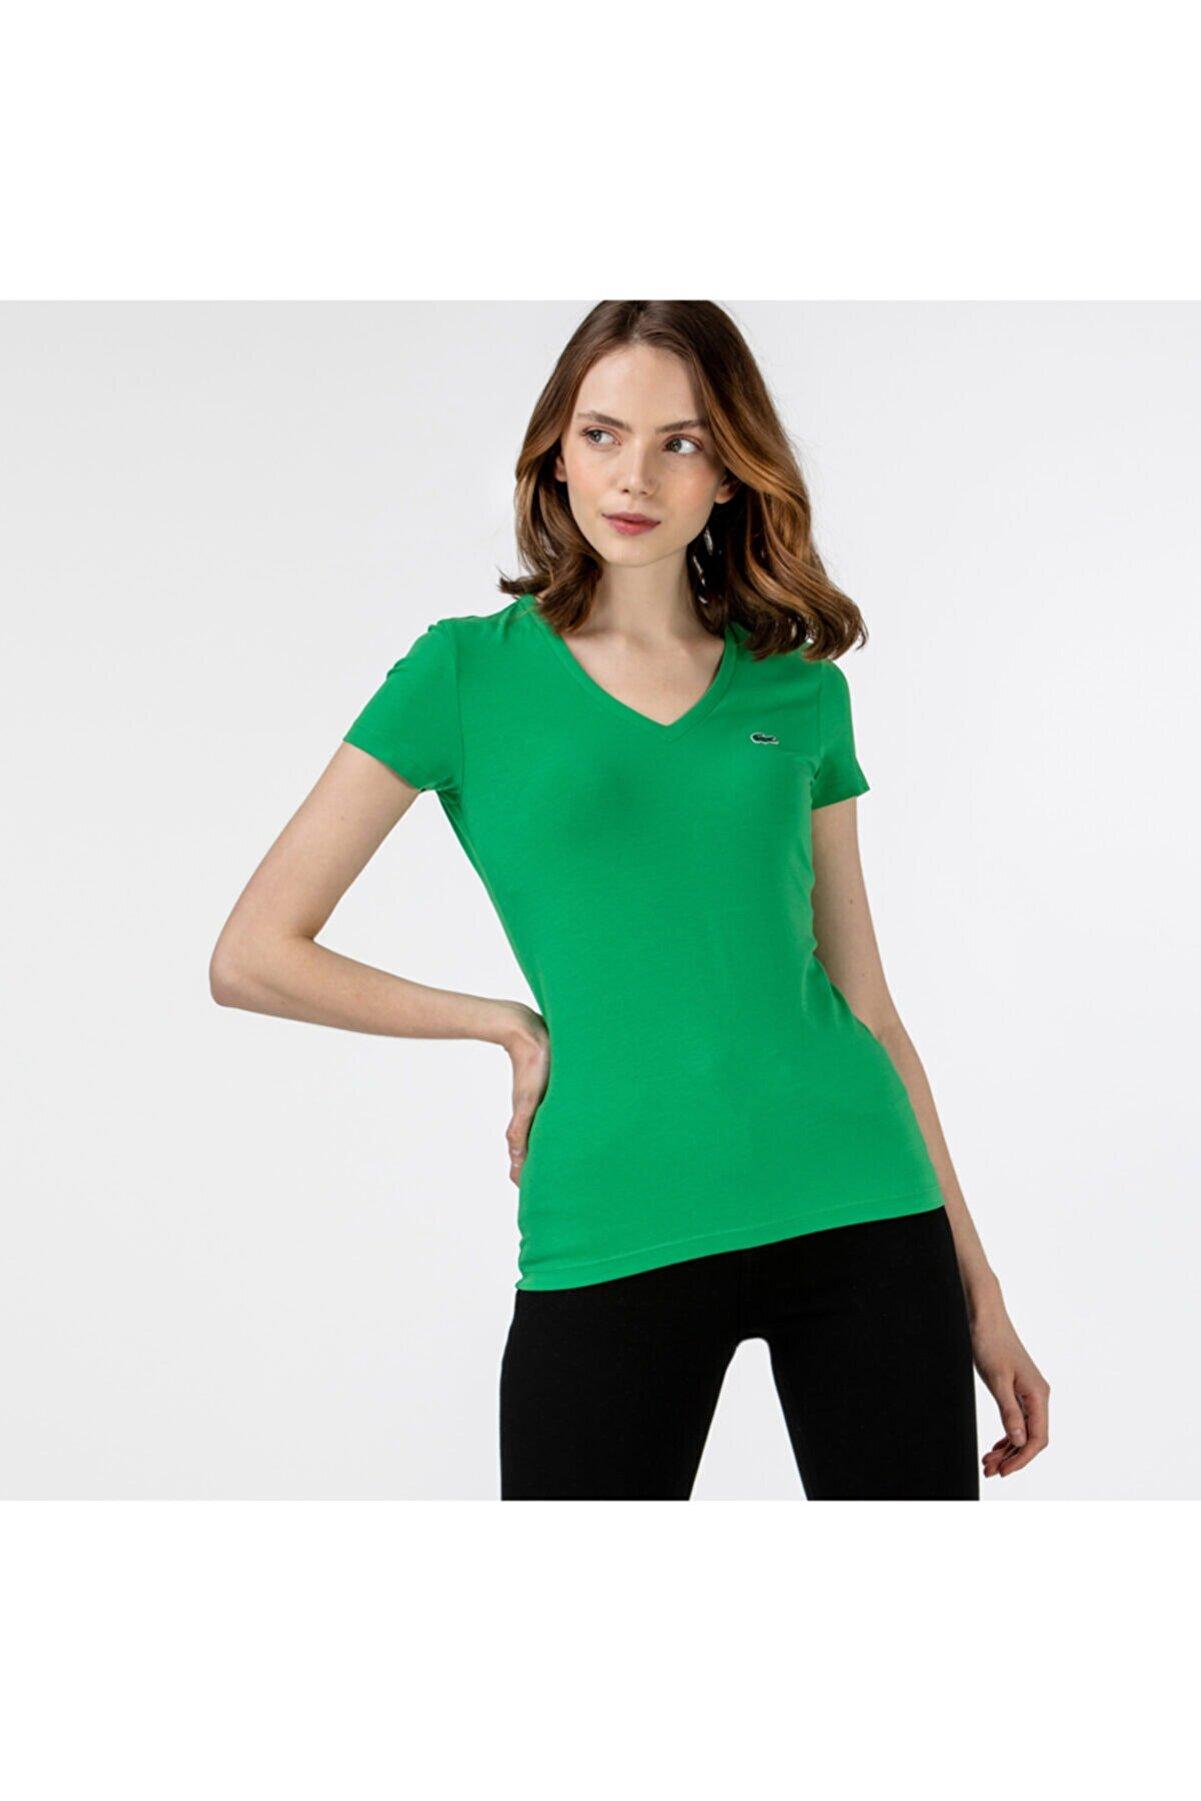 Lacoste Kadın Slim Fit V Yaka Yeşil T-Shirt TF0999